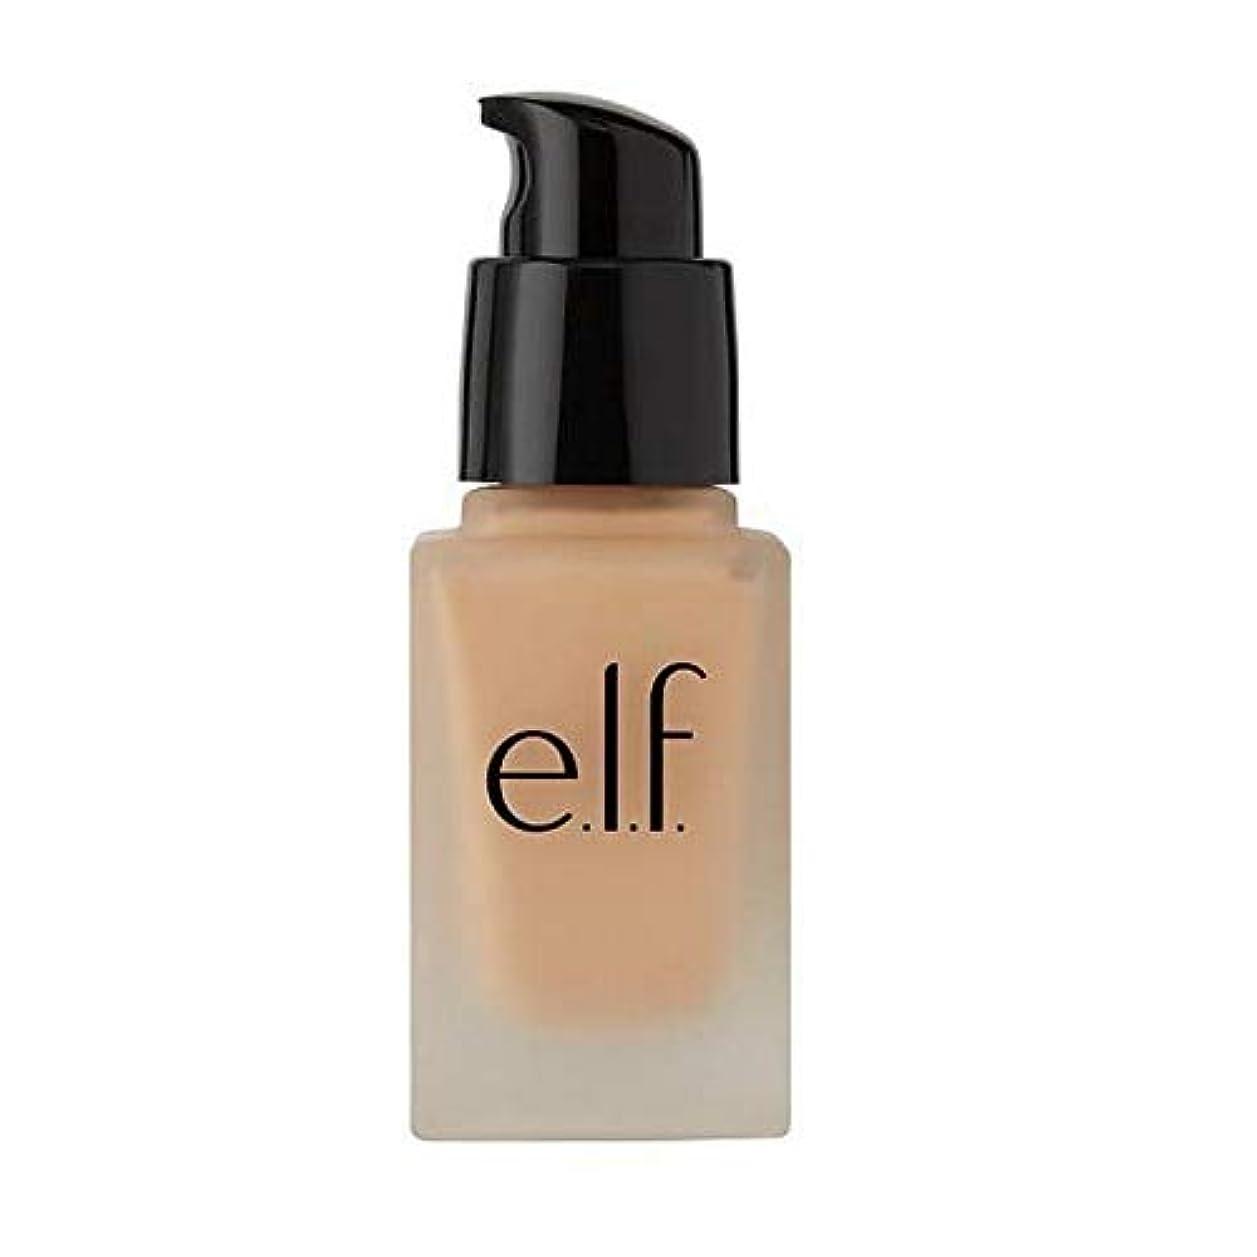 [Elf ] エルフ。完璧な基盤ヌード - e.l.f. Flawless Foundation Nude [並行輸入品]